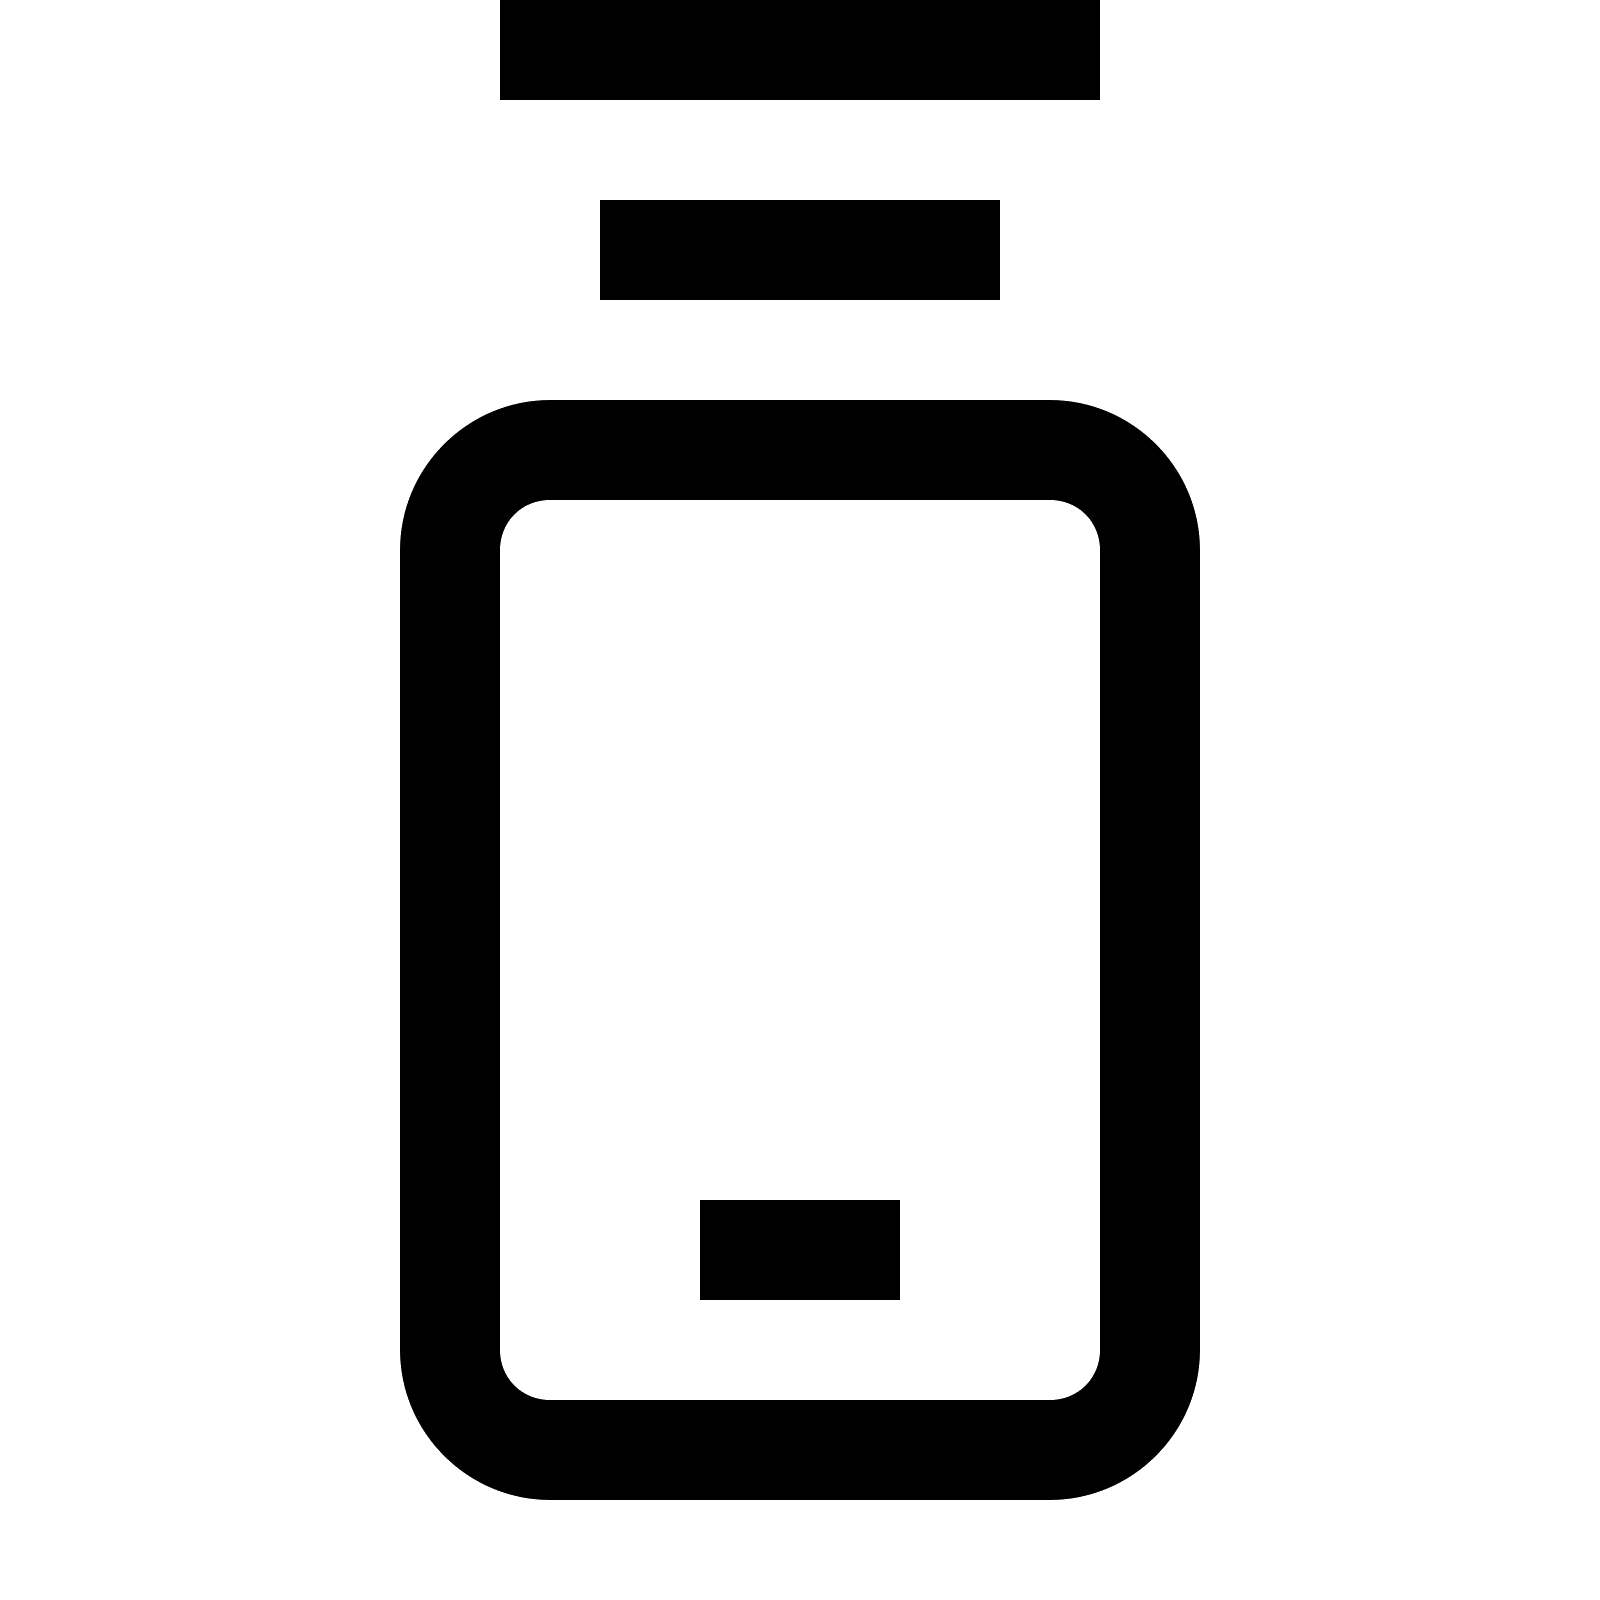 Speaker phone icono descarga. Clipart telephone speakerphone